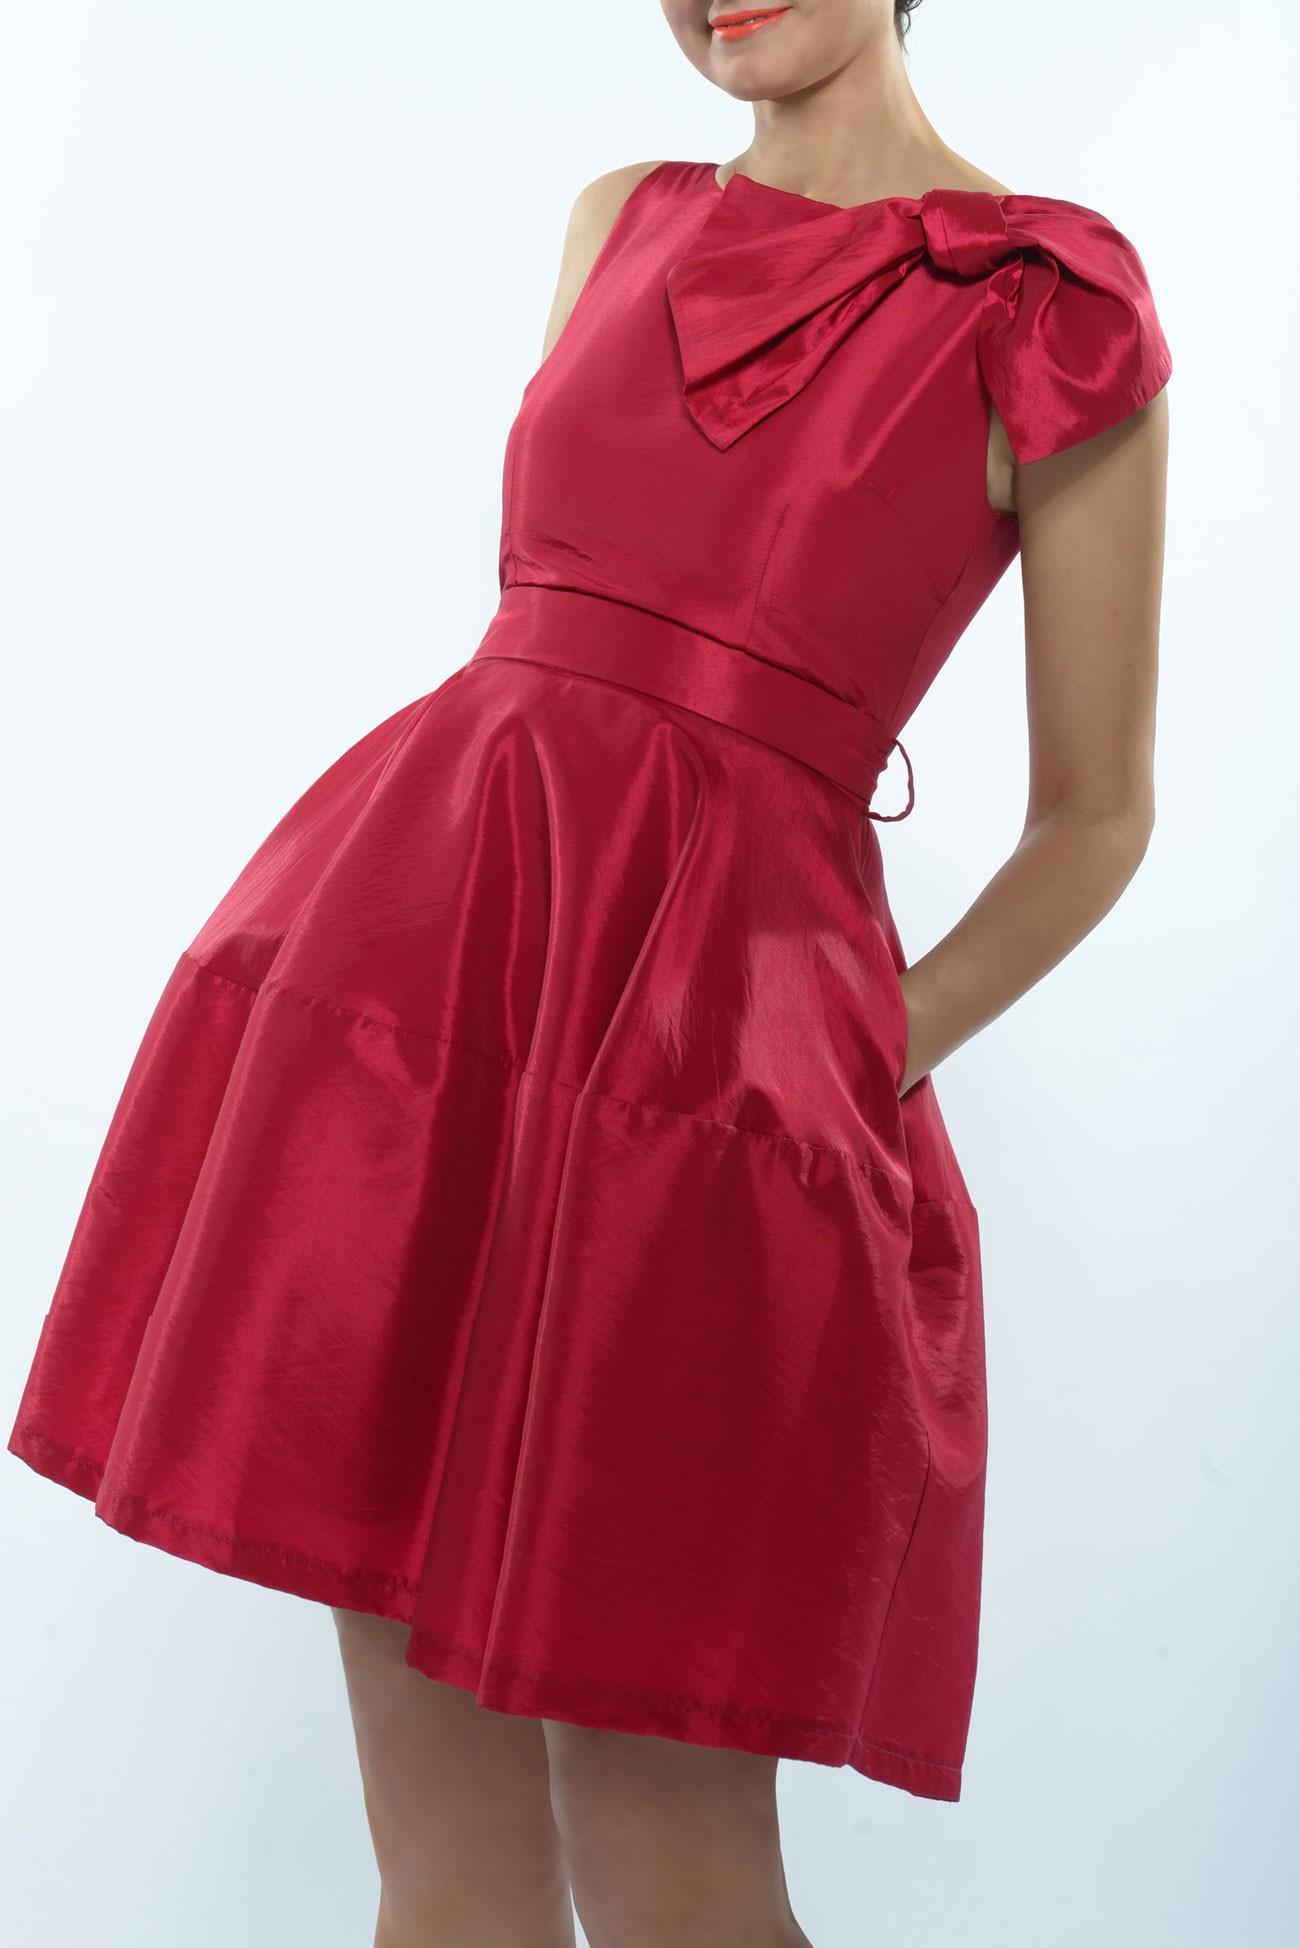 Rochie din tafta rosie cu funda foarte mare